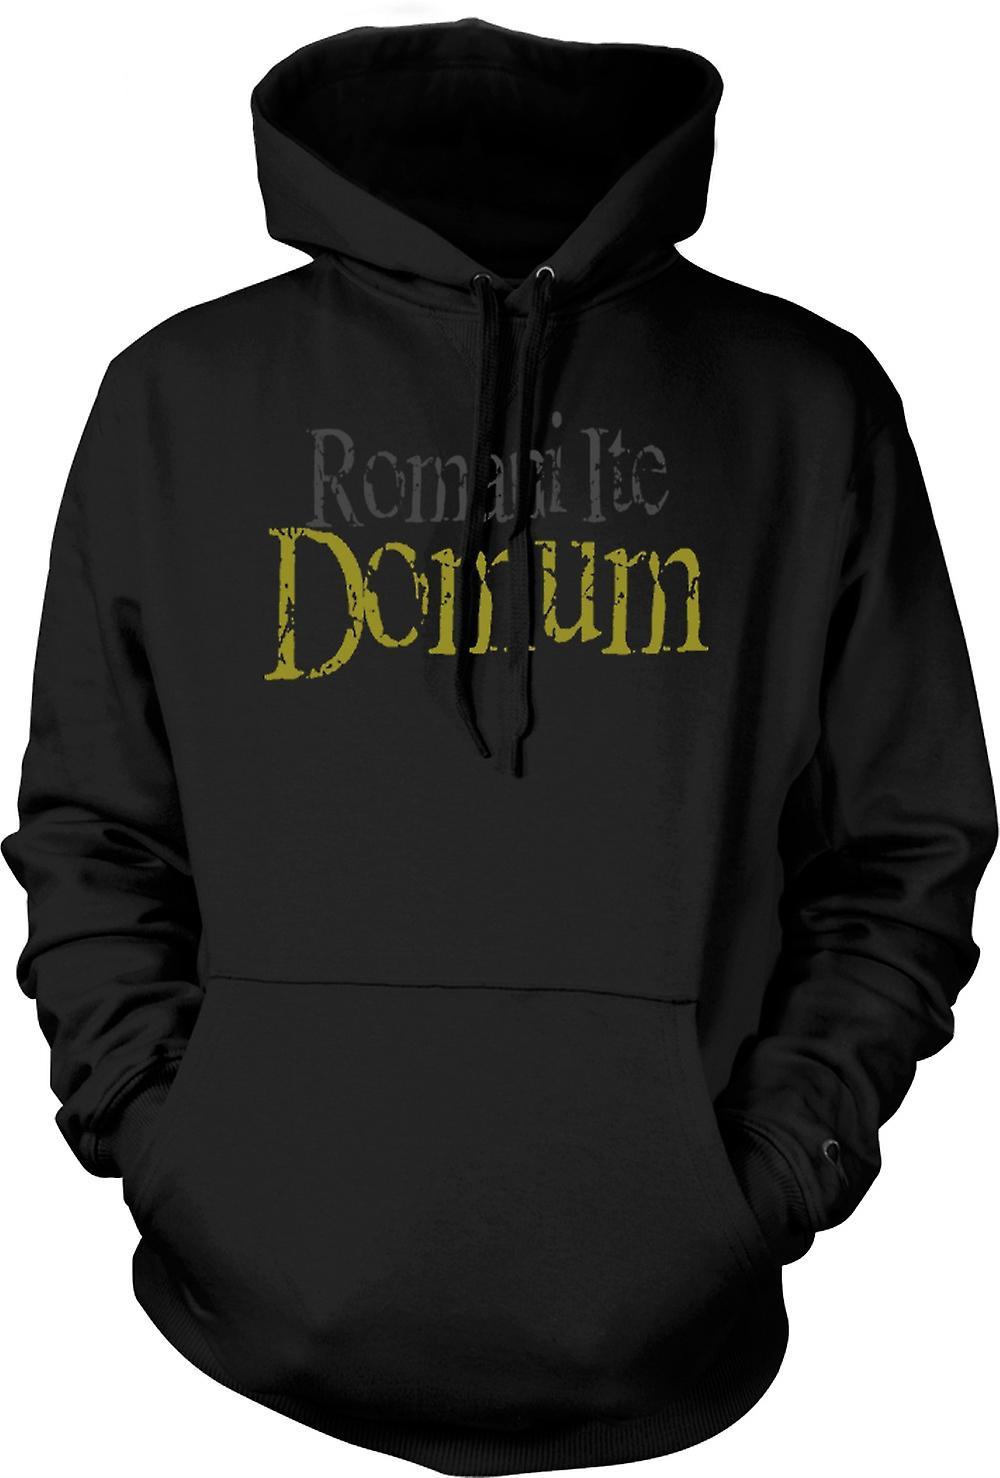 Kids Hoodie - Romani Ite Domum - Funny